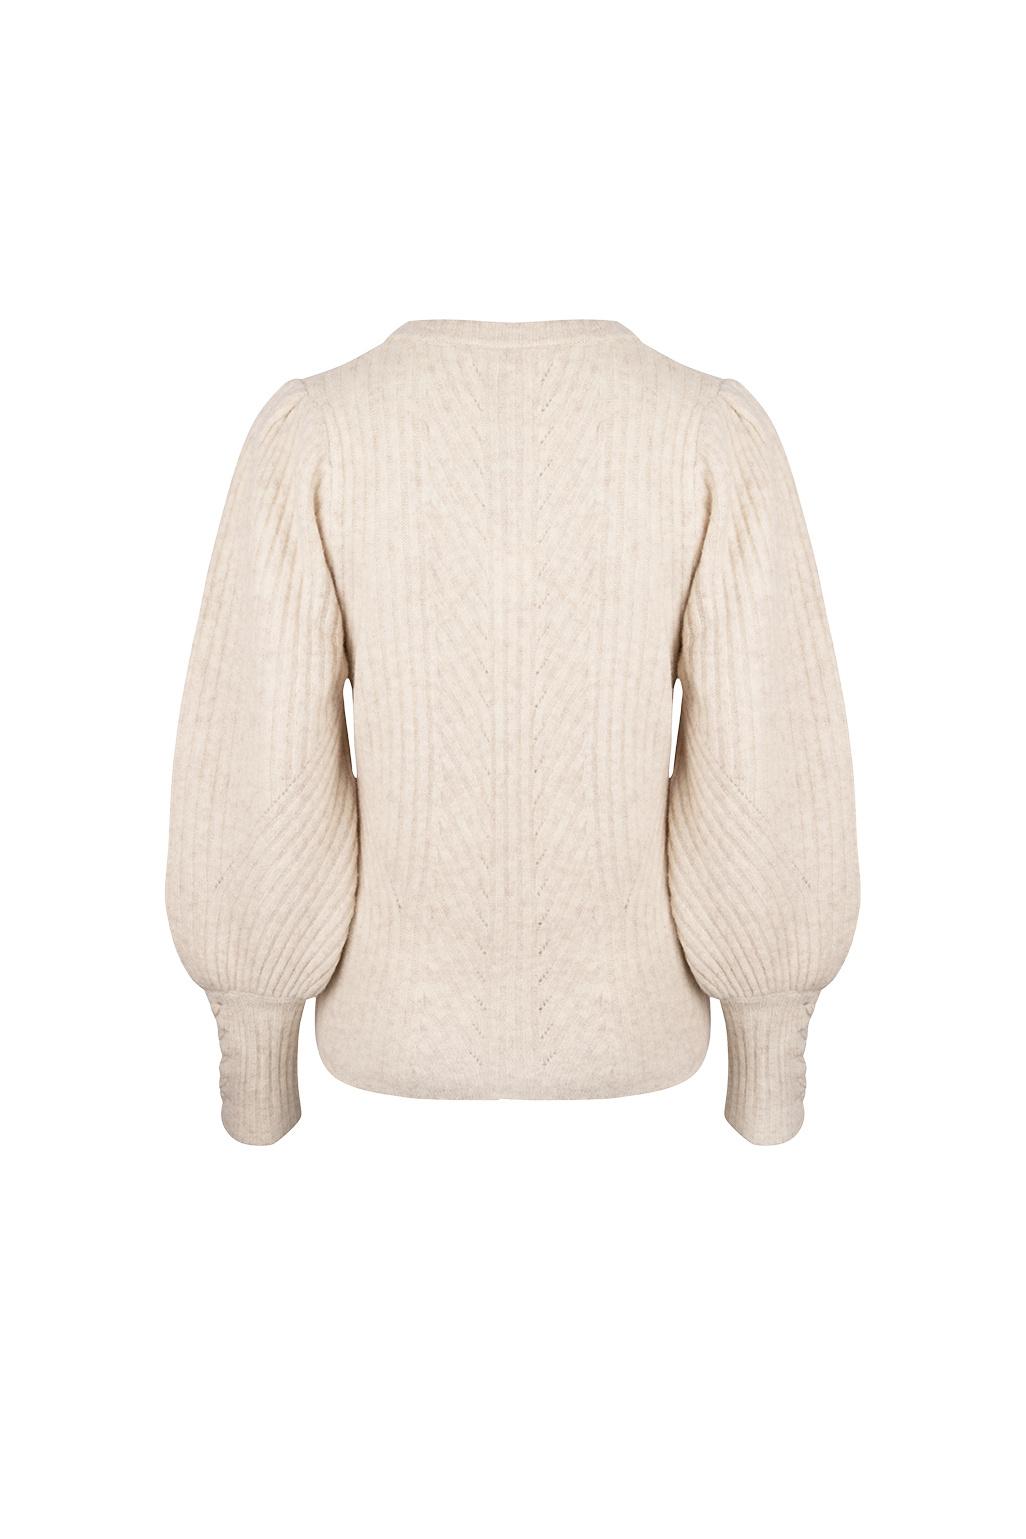 Salai Cable Sweater - Bone-3